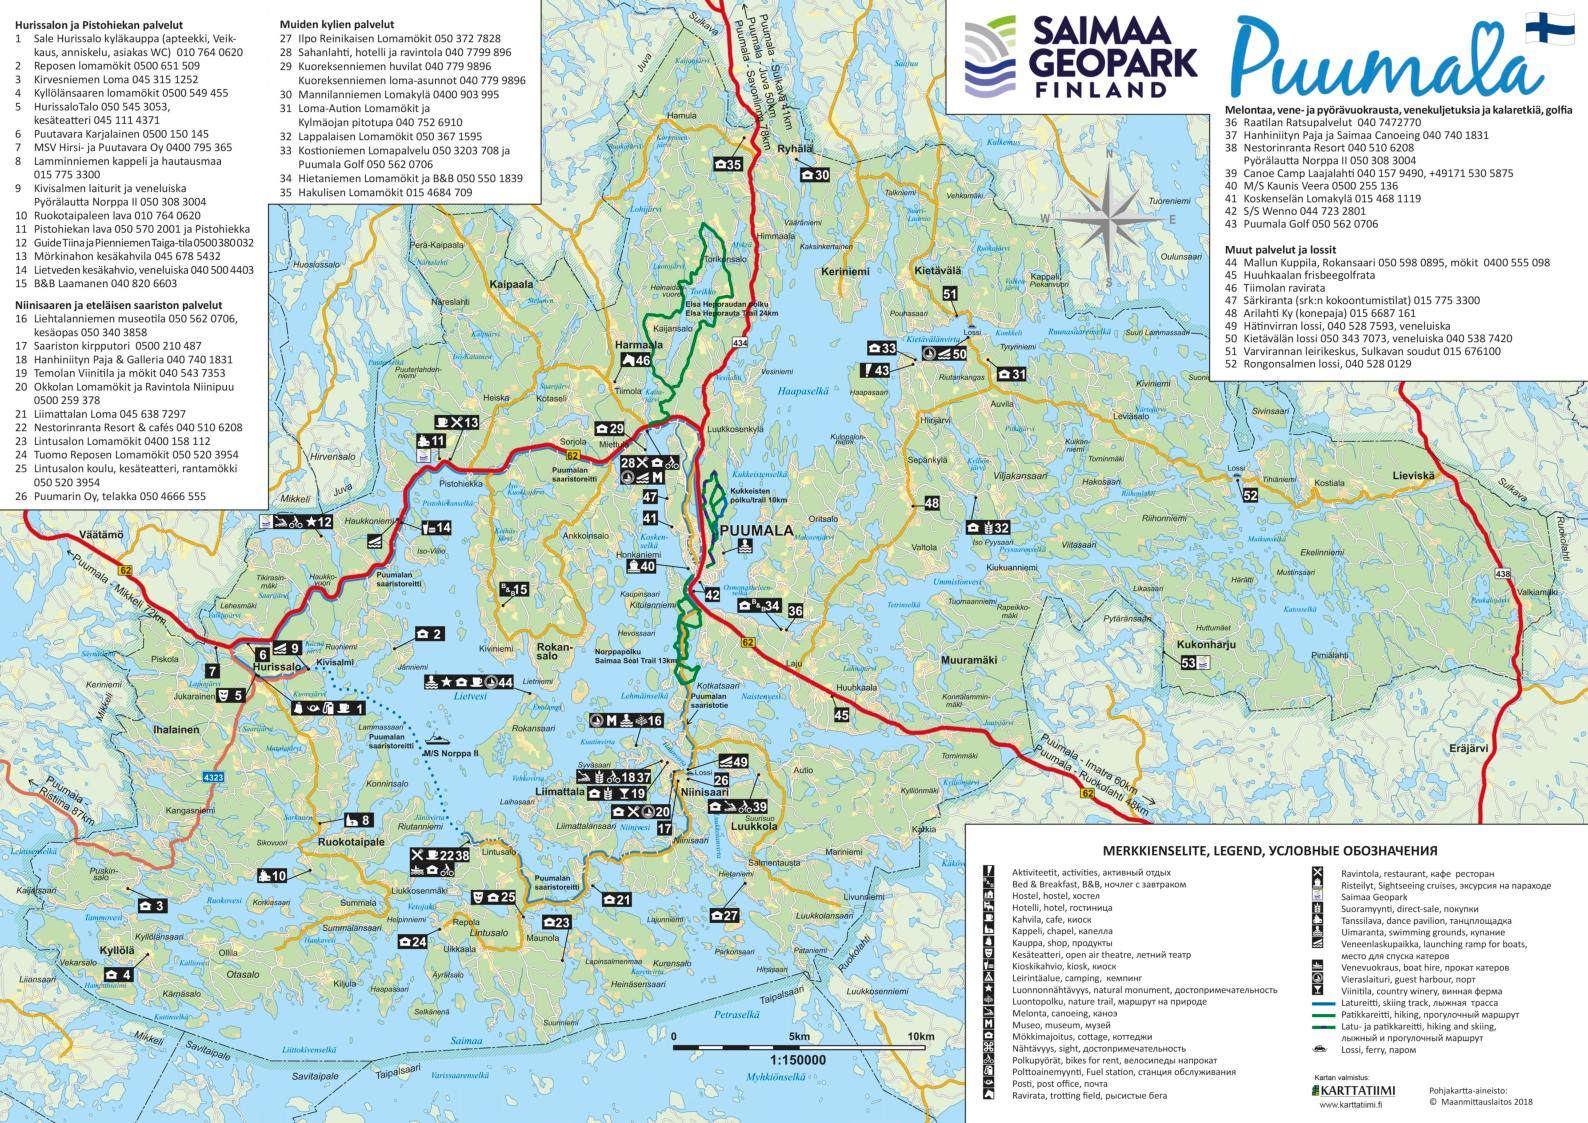 Calameo Puumala Kartta 2019